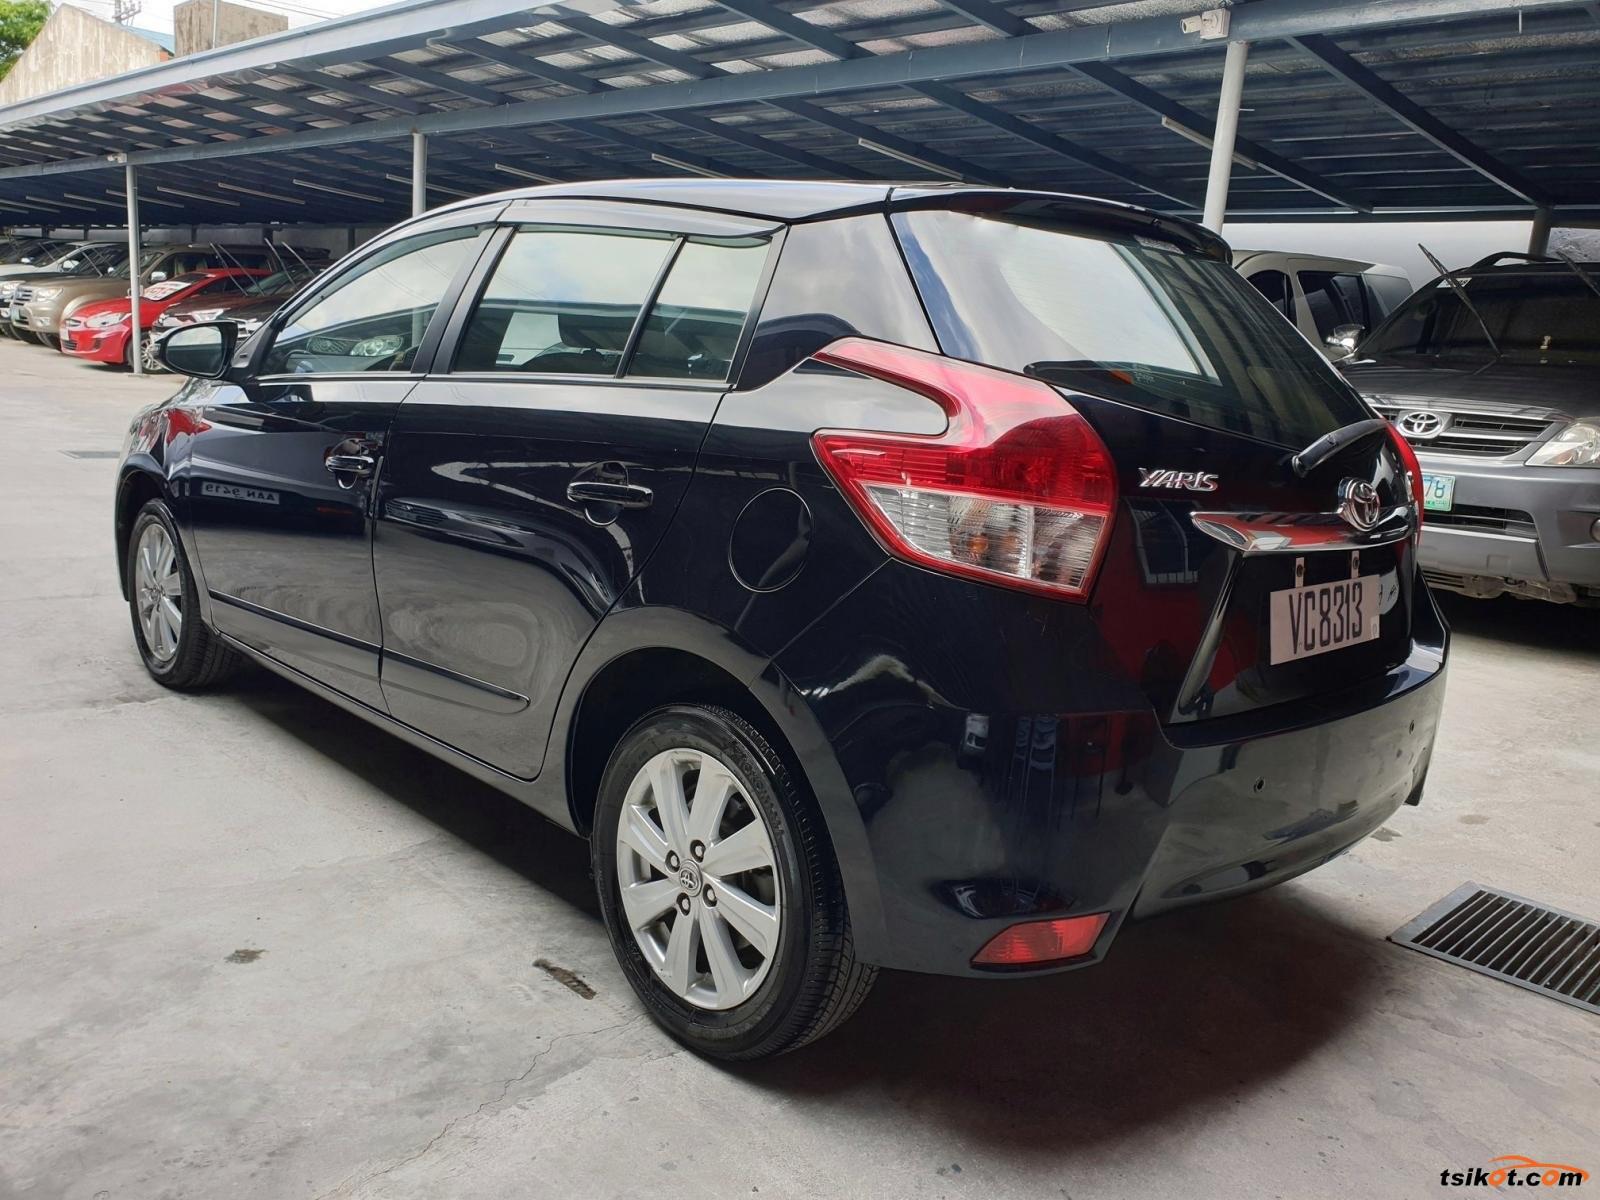 Toyota Yaris 2016 - 4